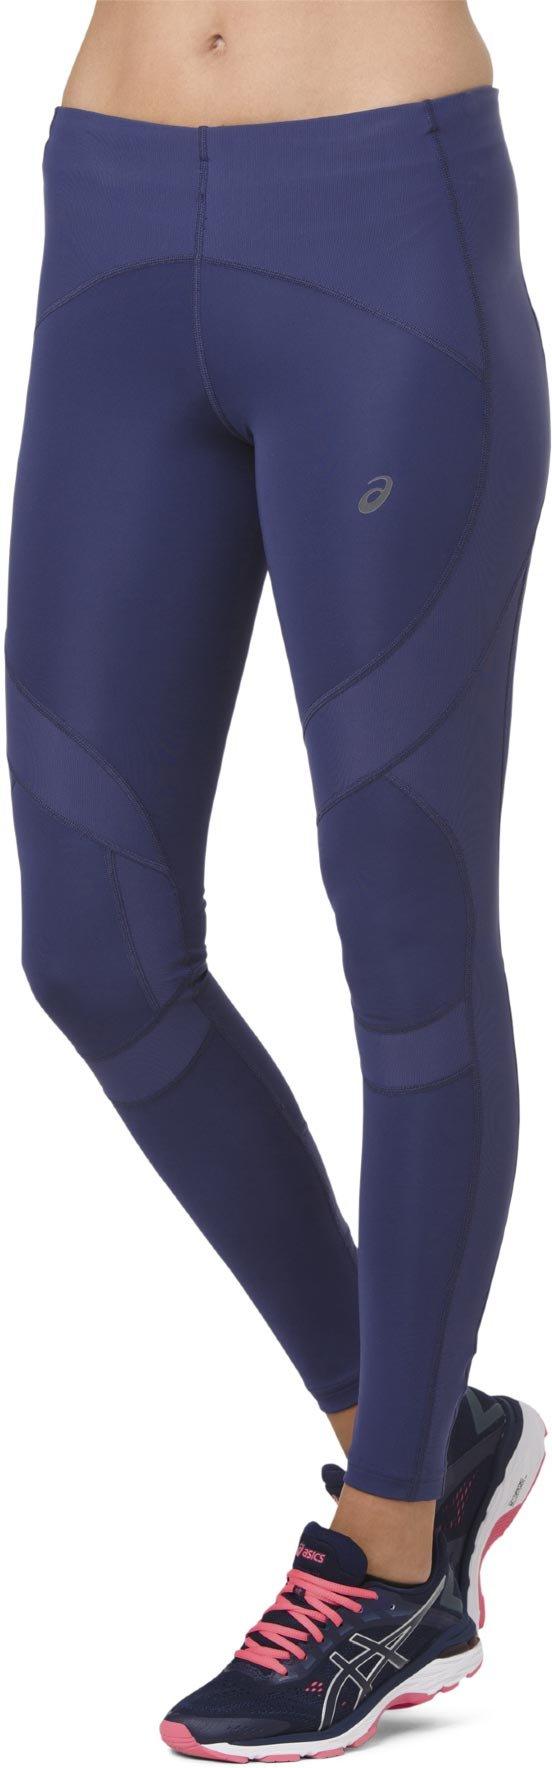 Asics Leg Balance Tight 2 XS